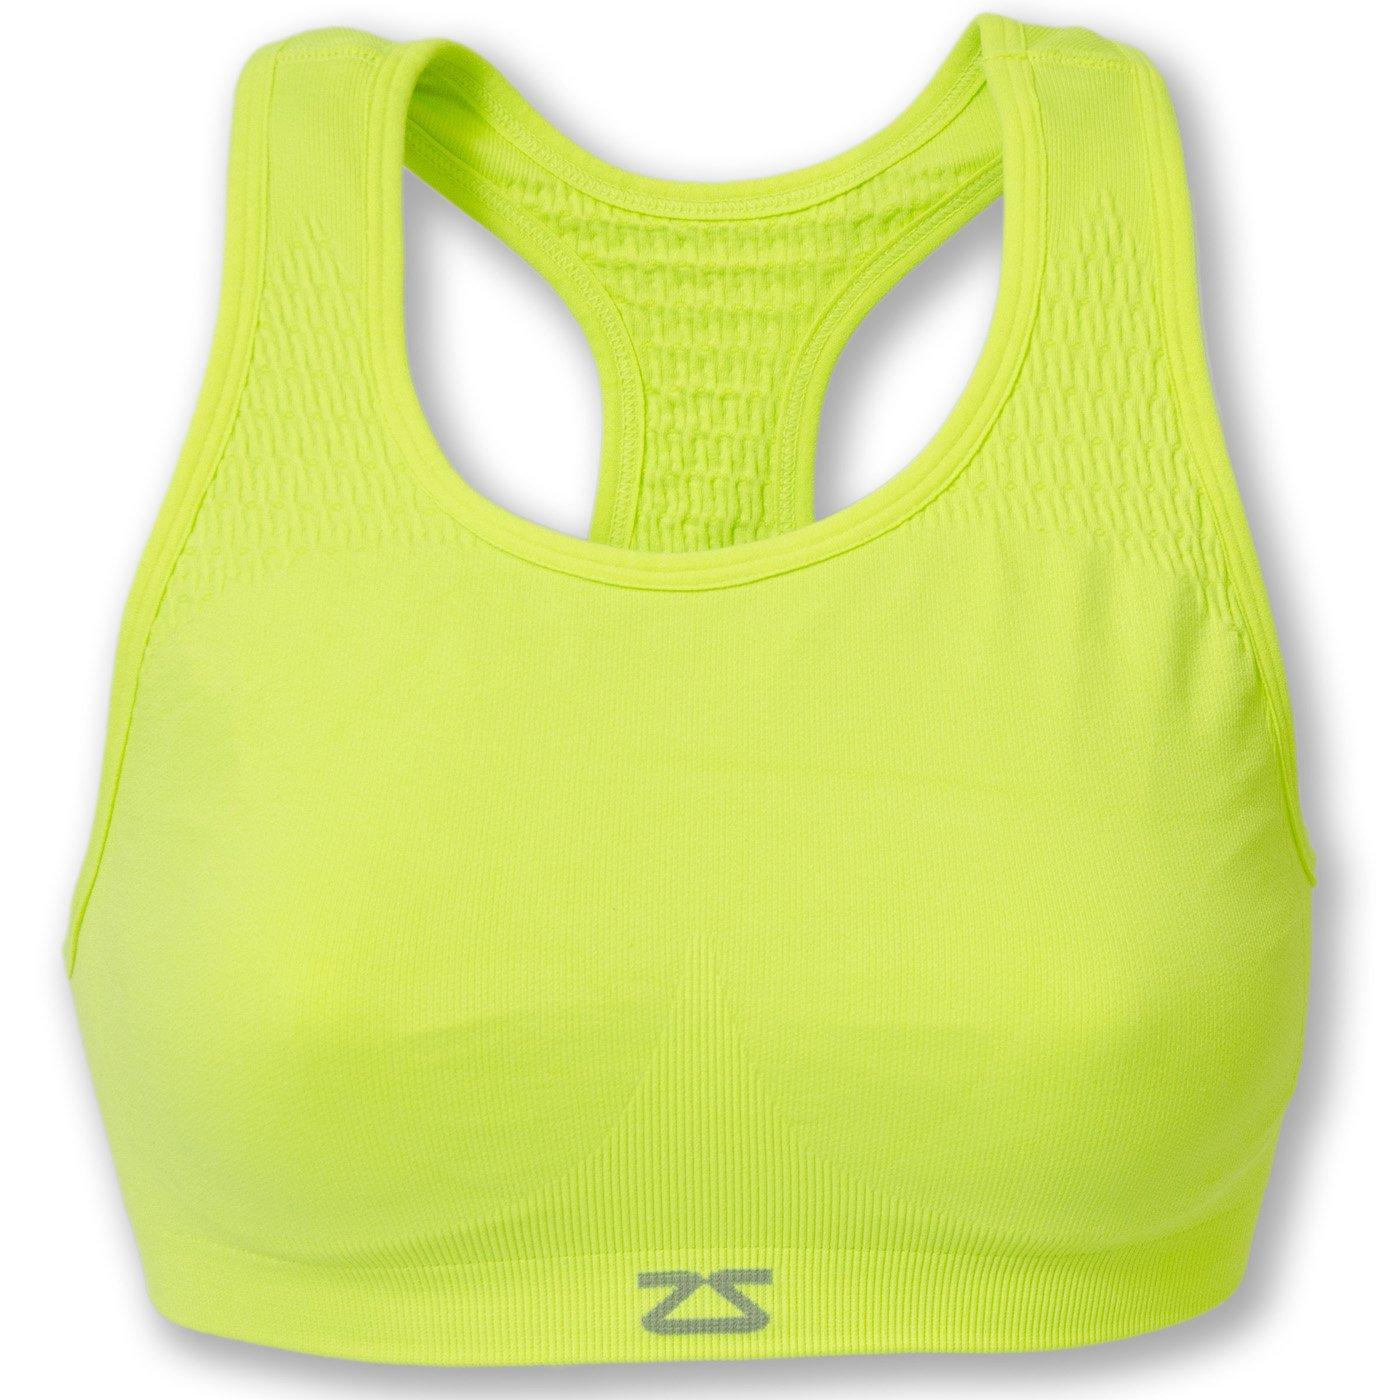 Zensah Seamless Sports Bra - Best Sports Bra for Running, Comfortable Sports Bra,Neon Yellow,Small/Medium by Zensah